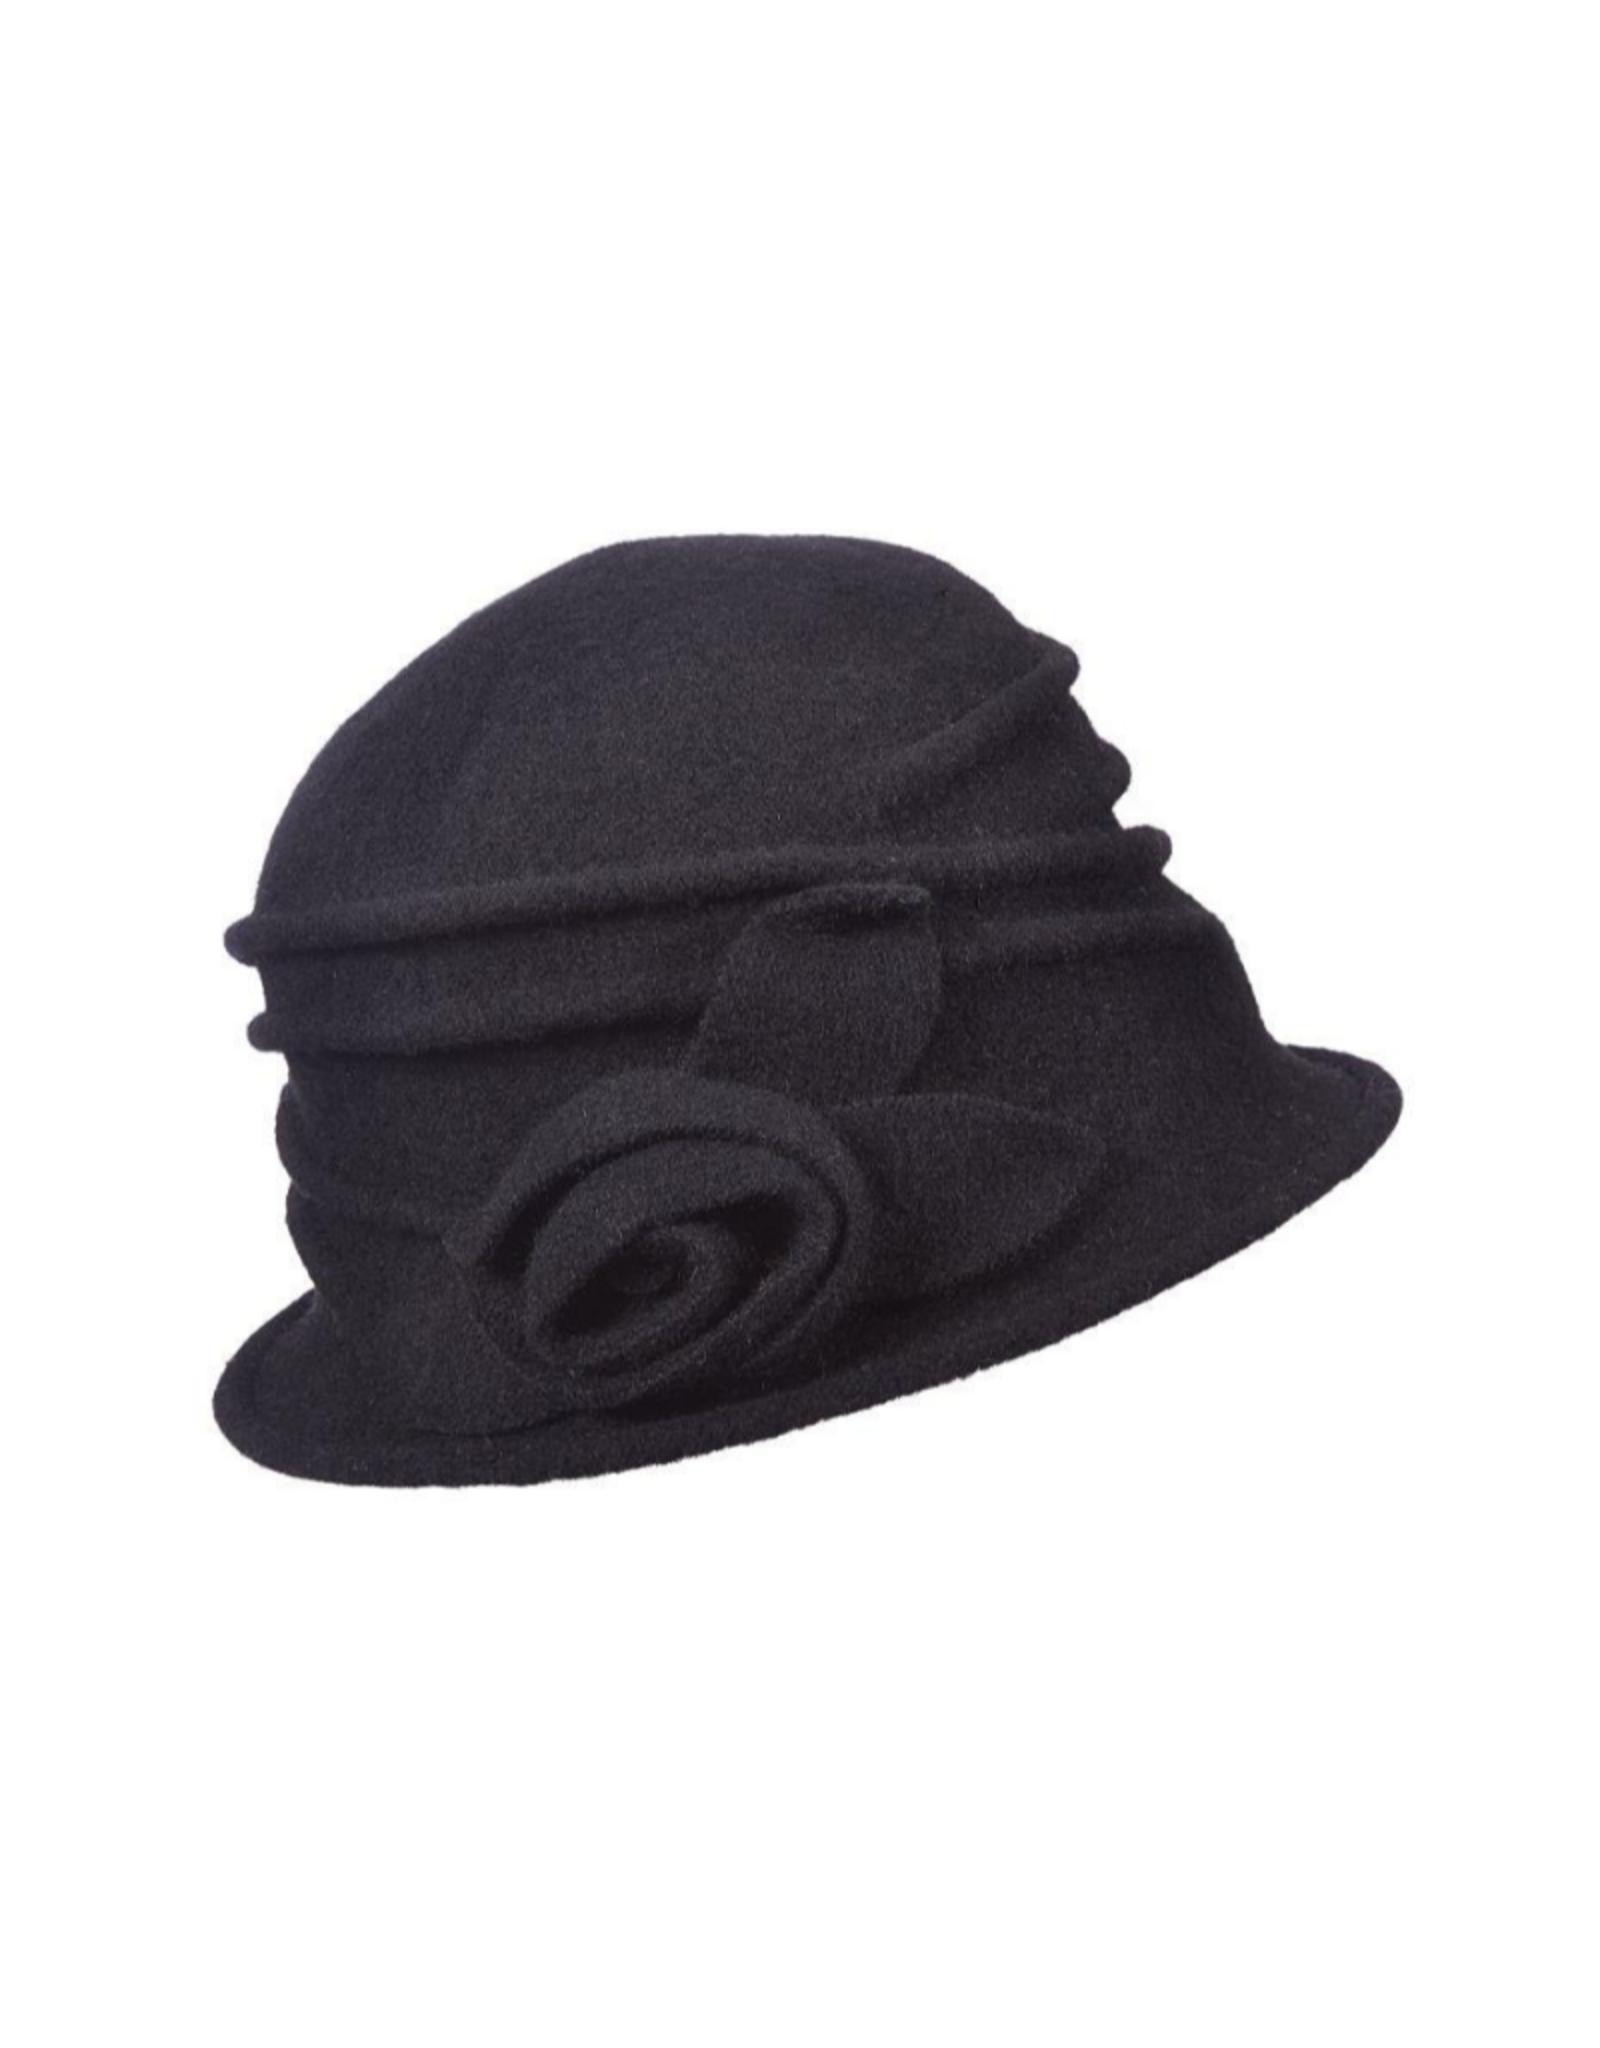 "HAT-CLOCHE-BOILED WOOL ""SIENNA"" ROSETTE"